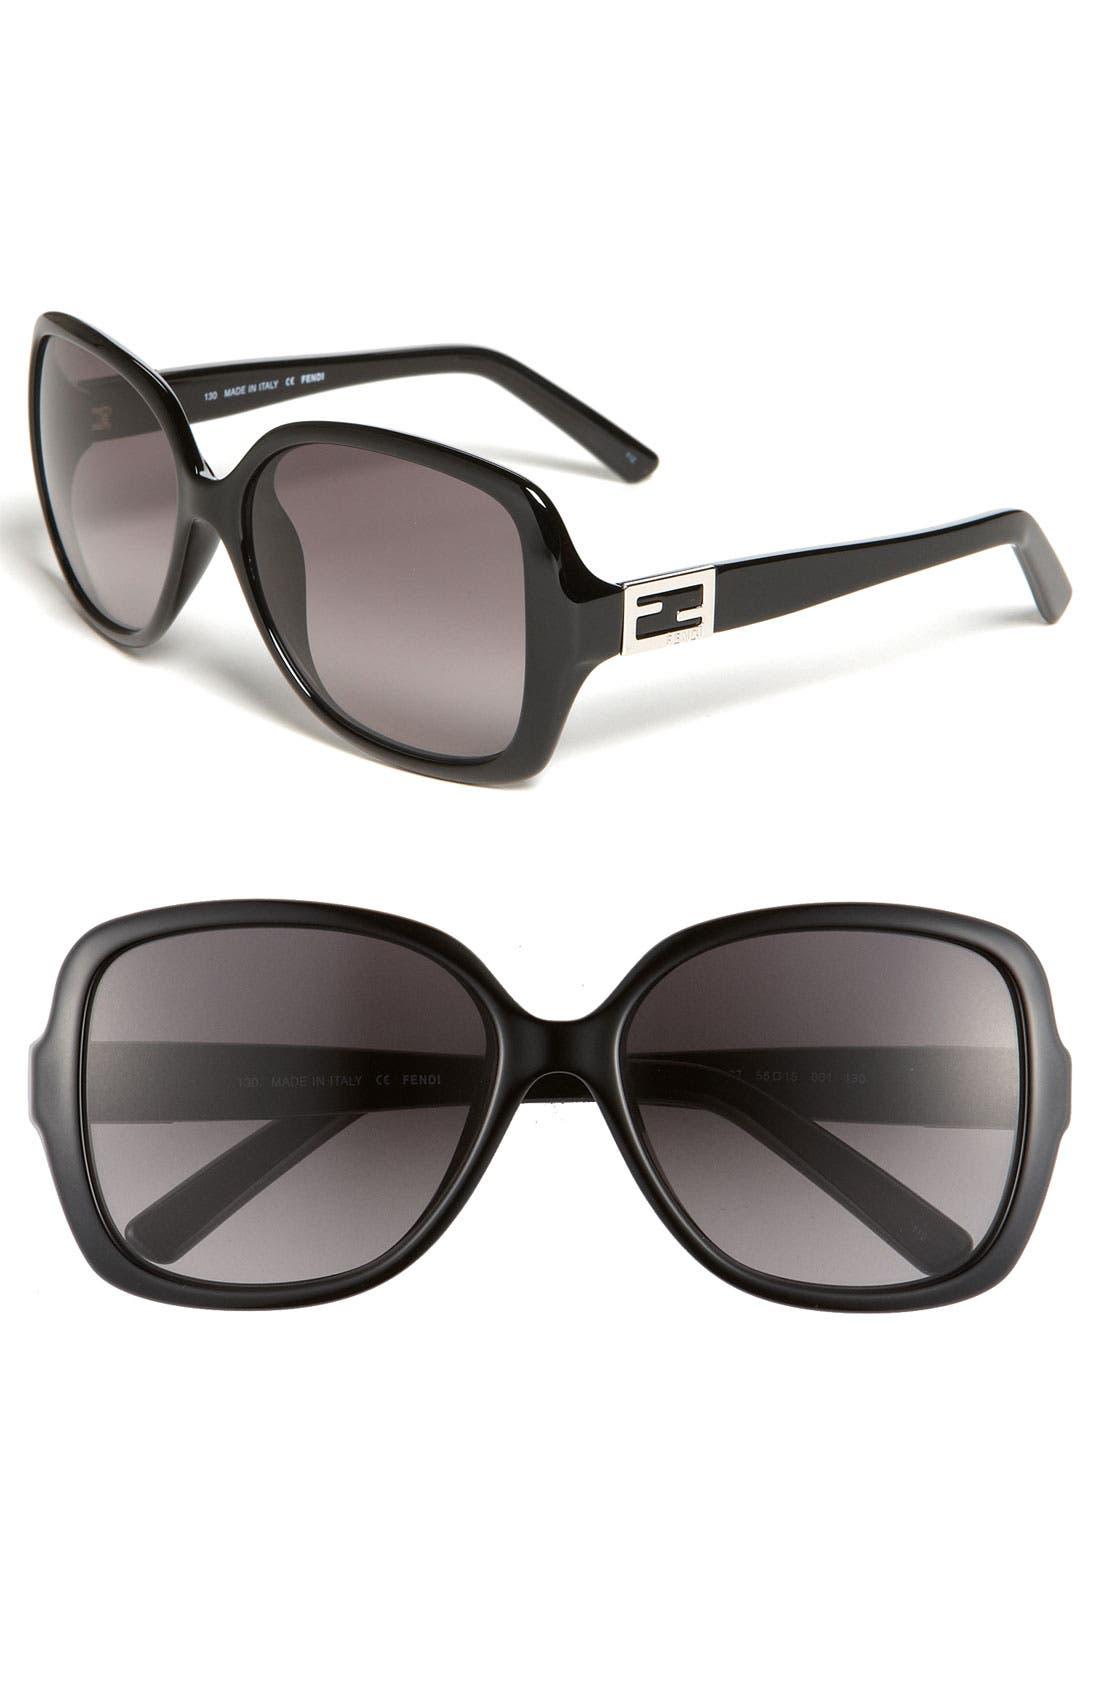 Main Image - Fendi 'Classic' 56mm Sunglasses